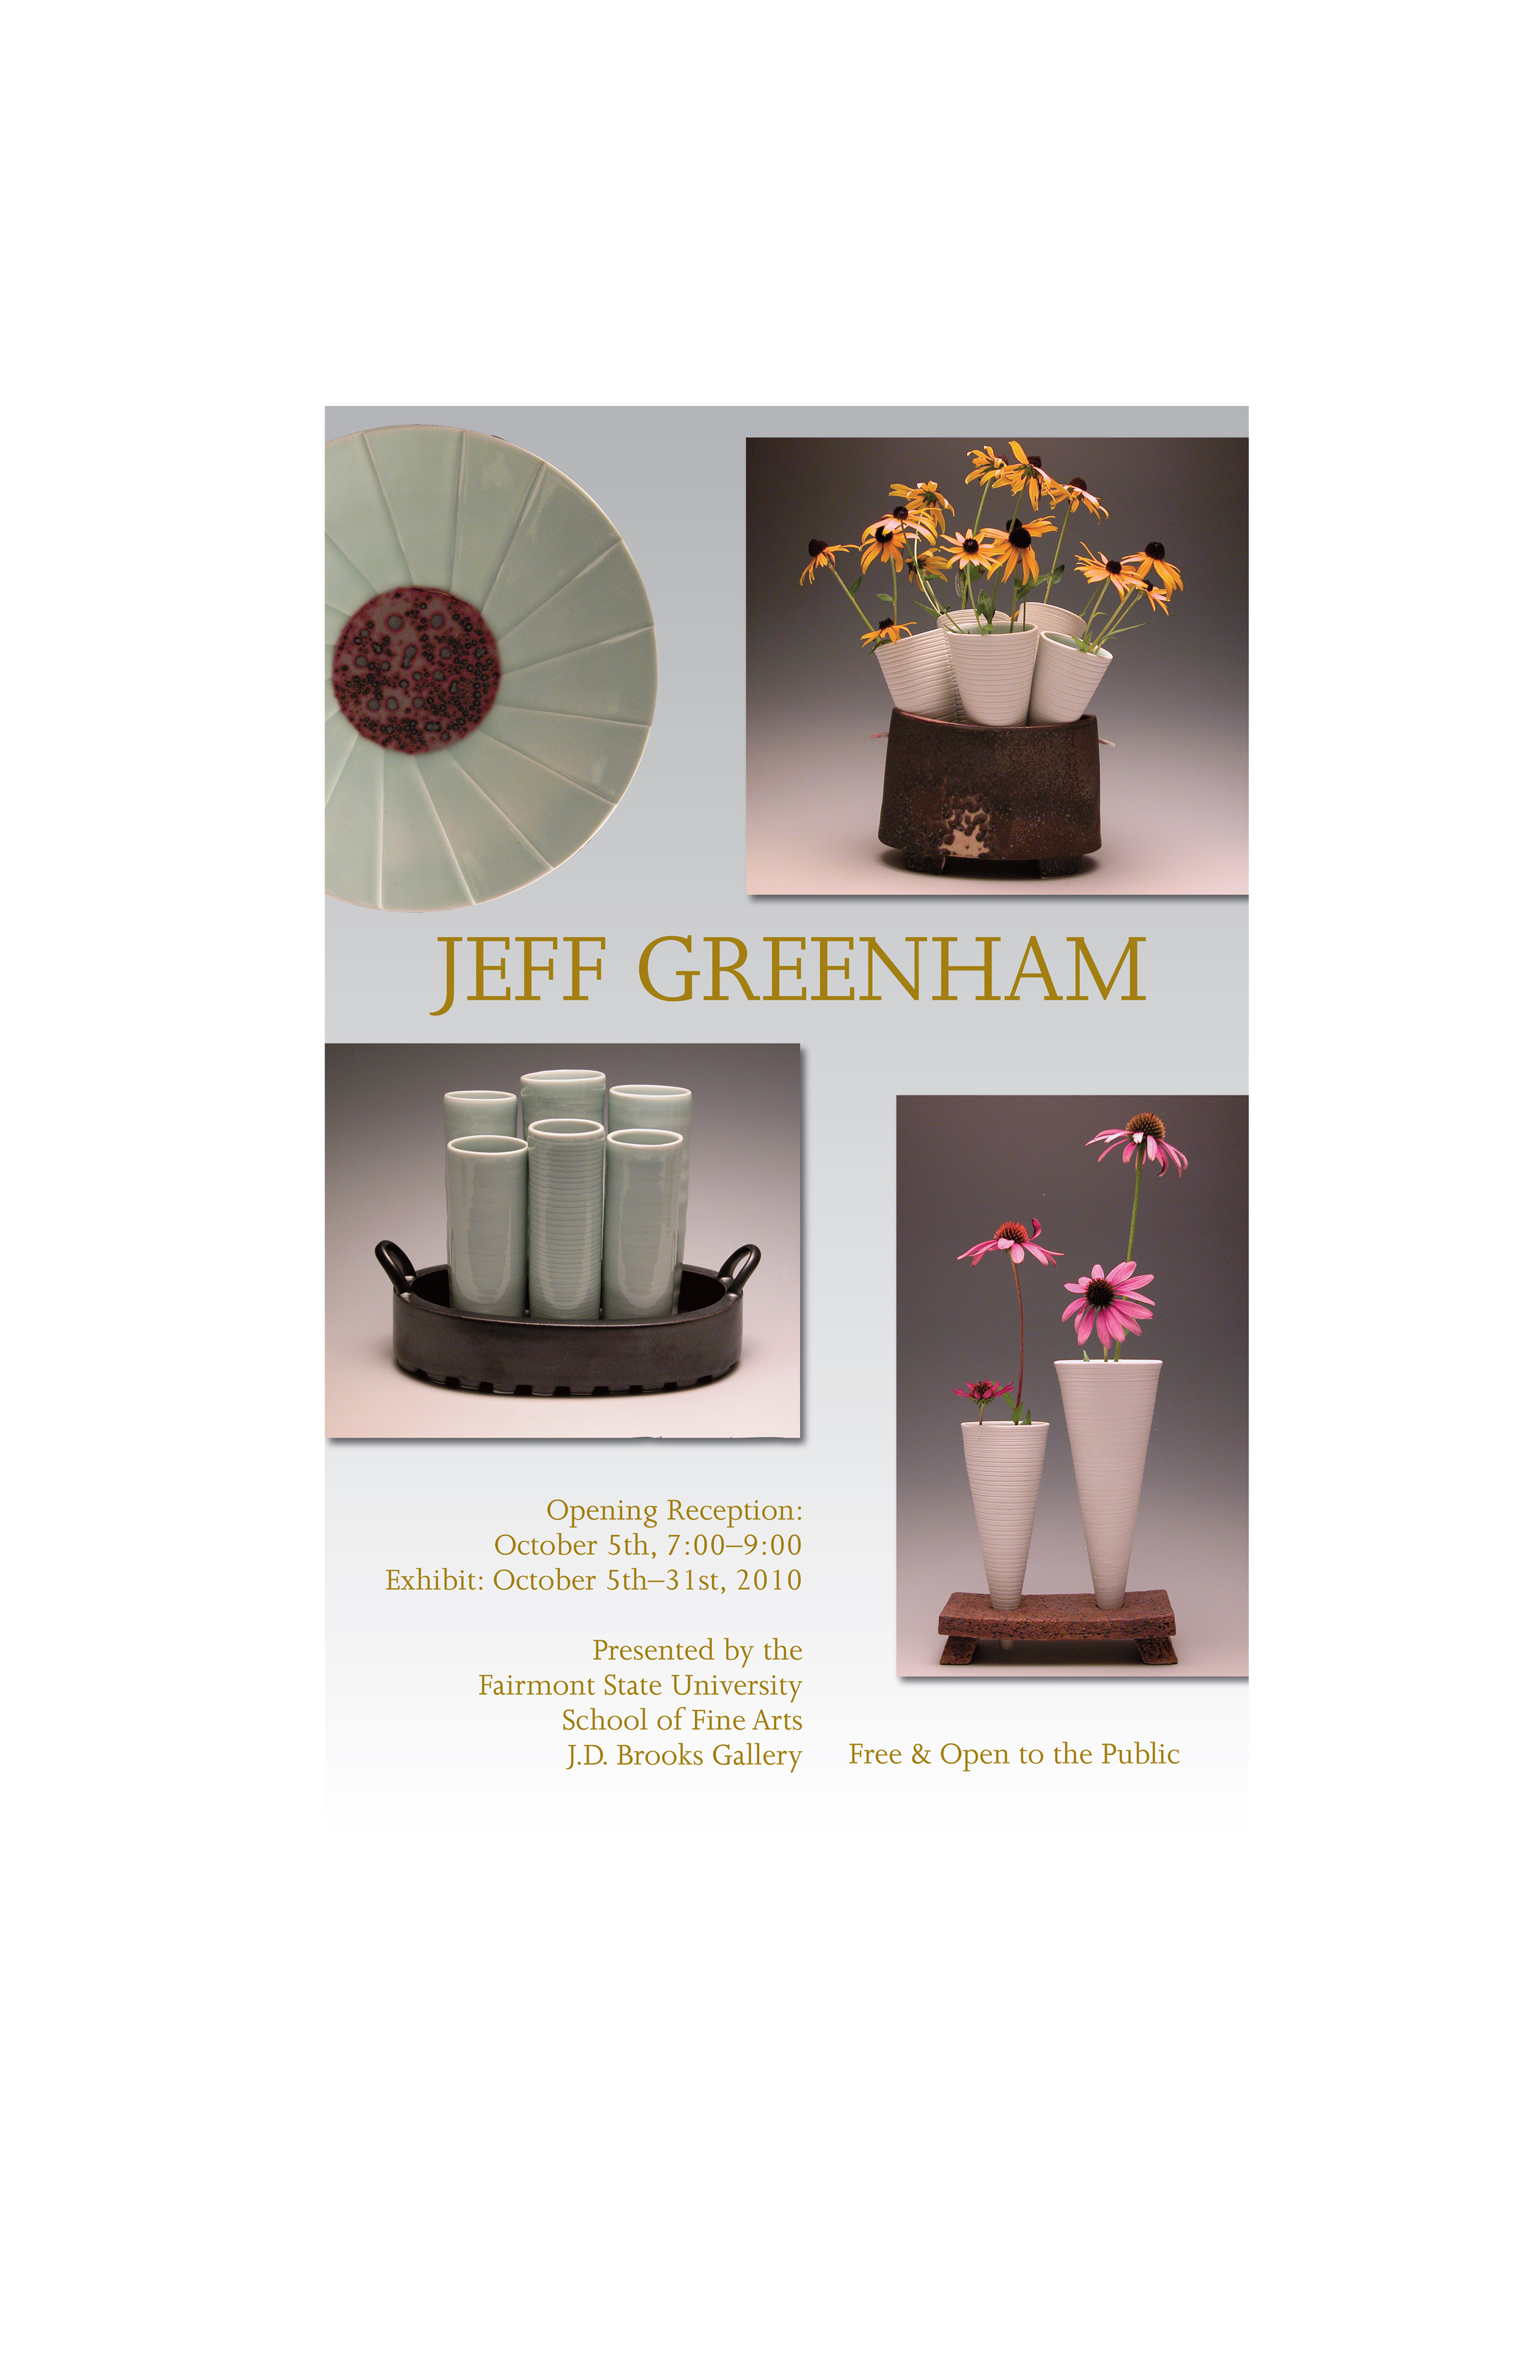 Jeff Greenham posterLayout 1.jpg